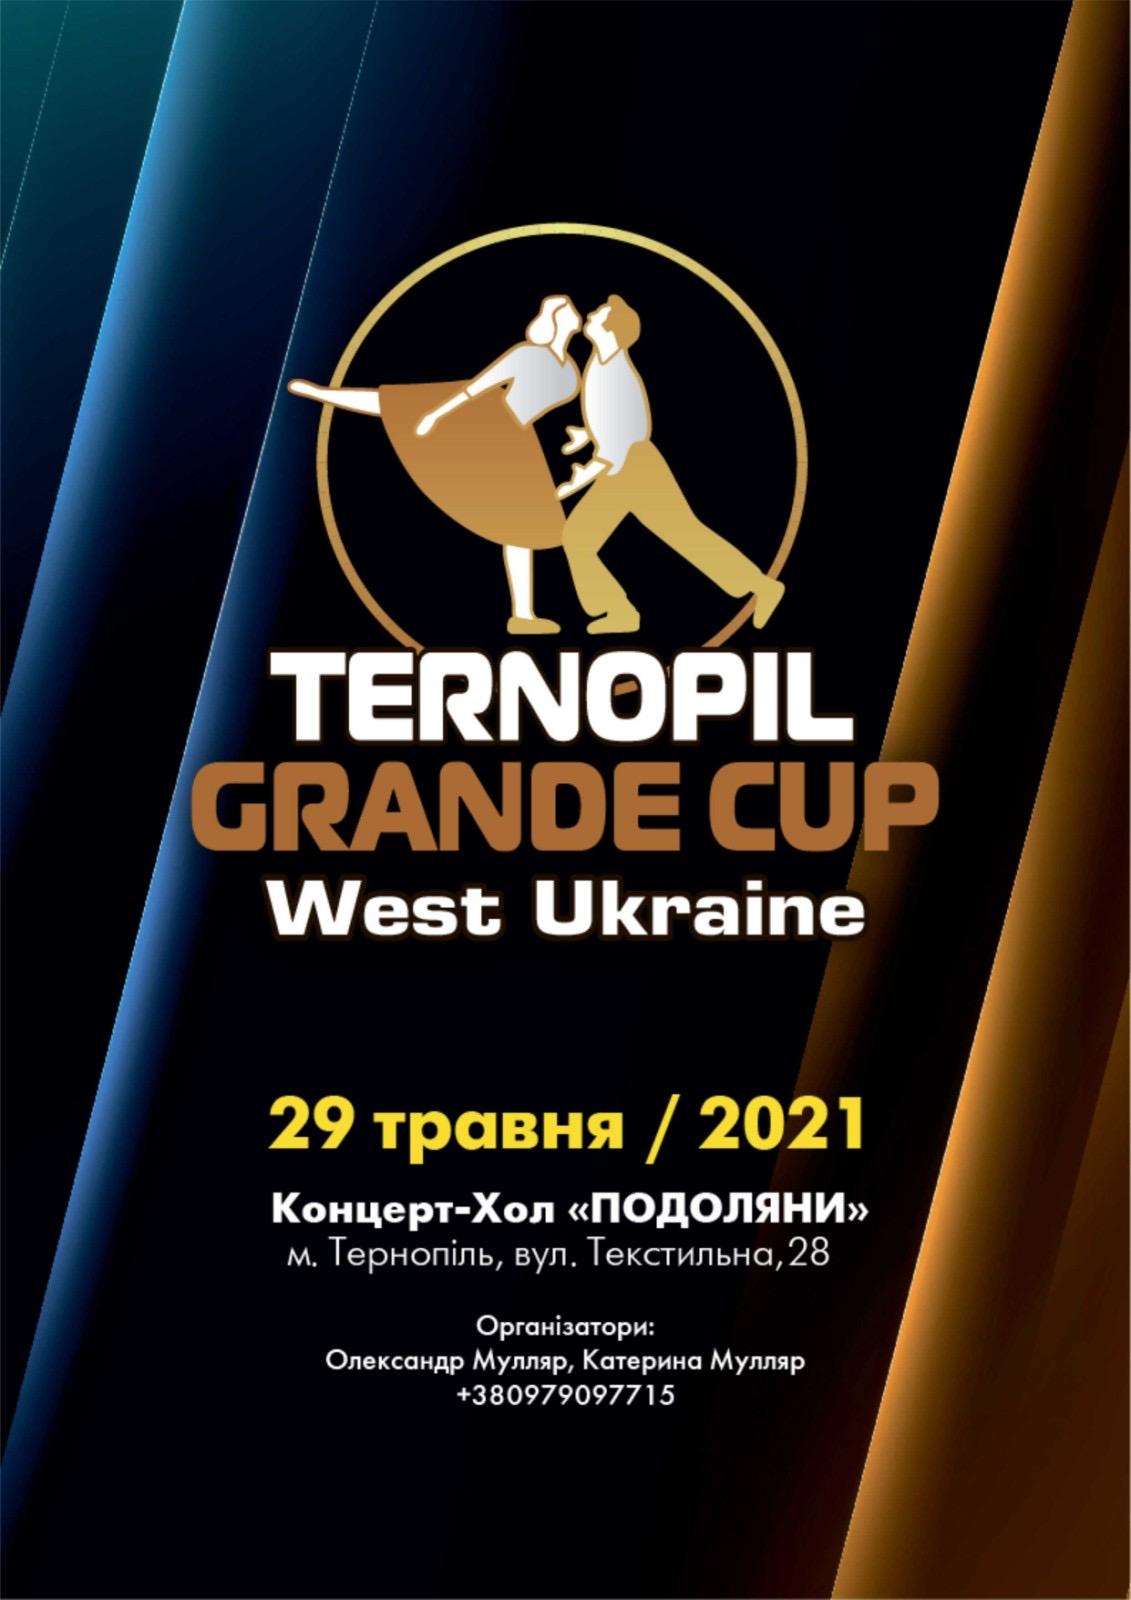 Ternopil Grande Cup West Ukraine